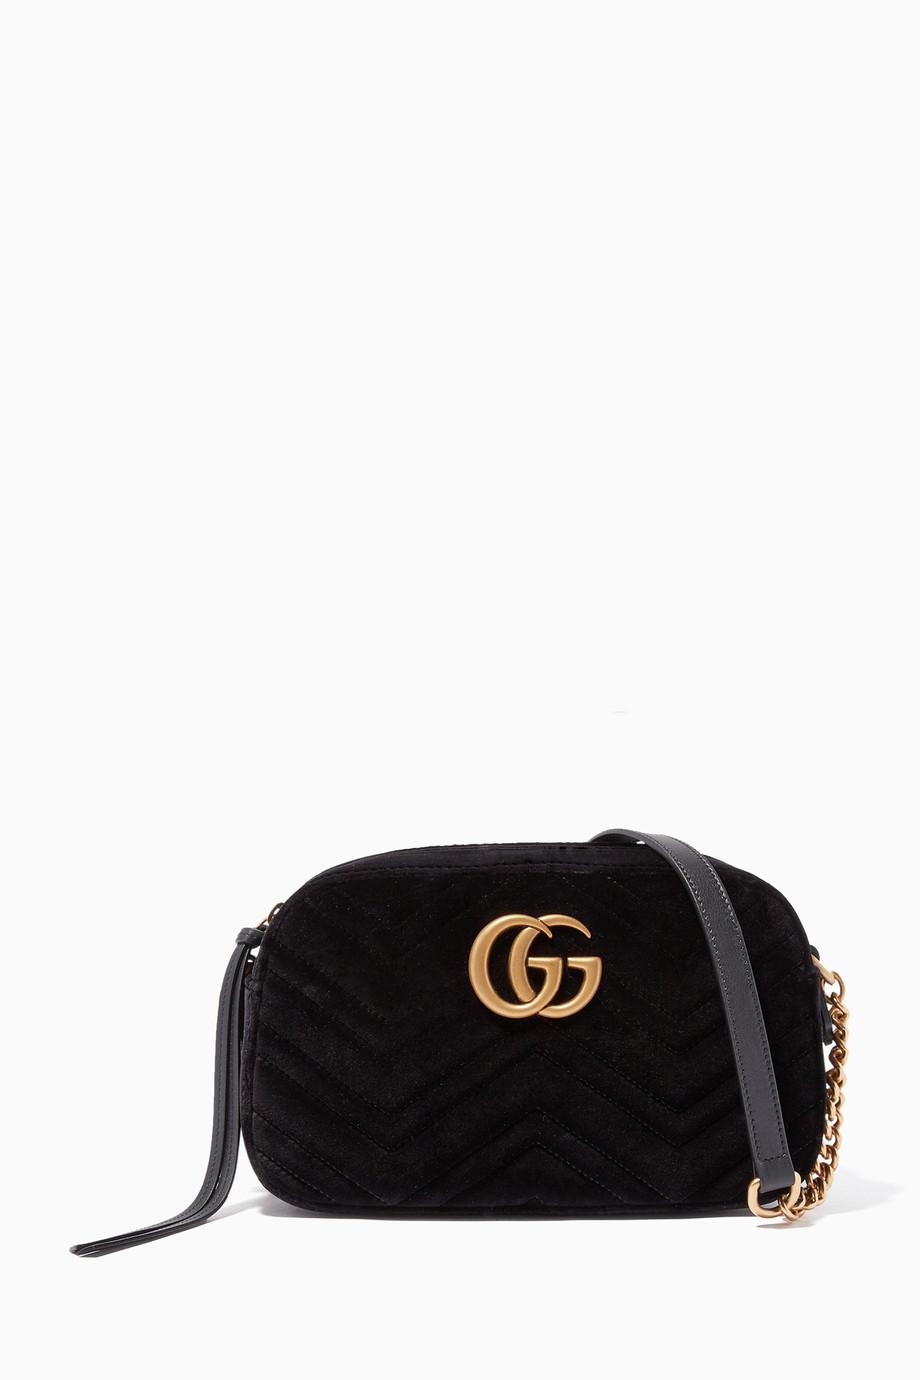 4bc55db4b6f4 Shop Gucci Black Black Velvet Small GG Marmont Shoulder Bag for ...